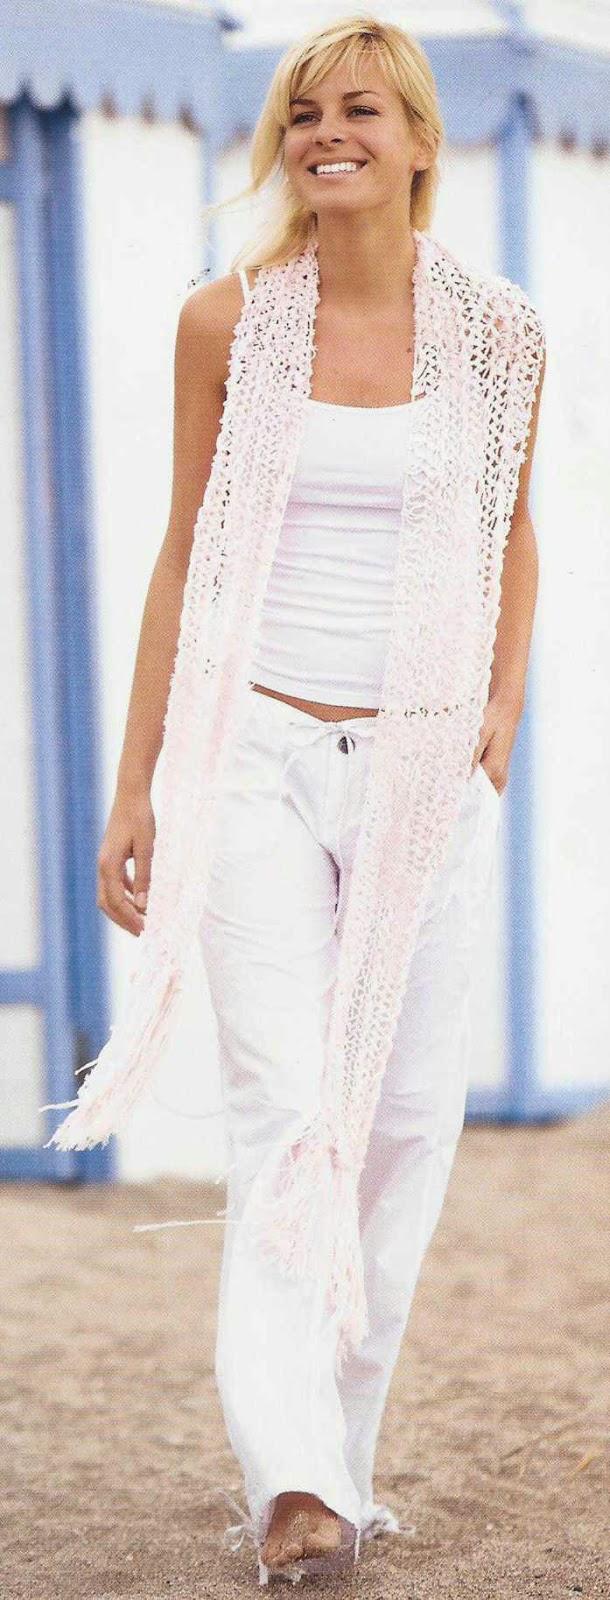 #69 Chal o Bufanda a Crochet